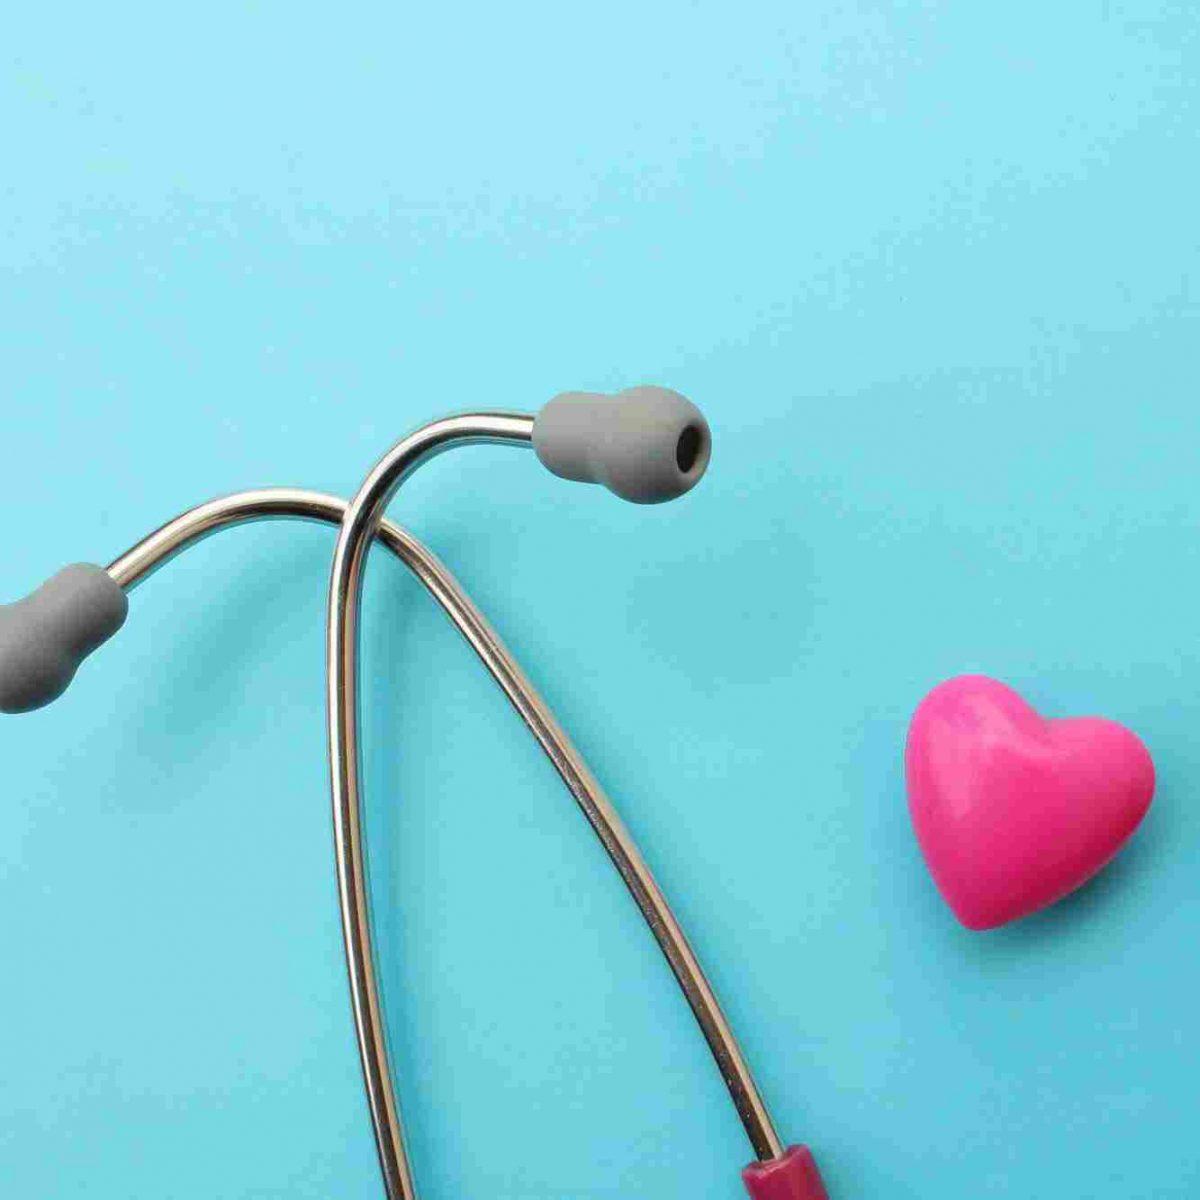 https://kinderarztpraxis-fulda.de/wp-content/uploads/2015/12/srce-i-stetoskop-1200x1200.jpg